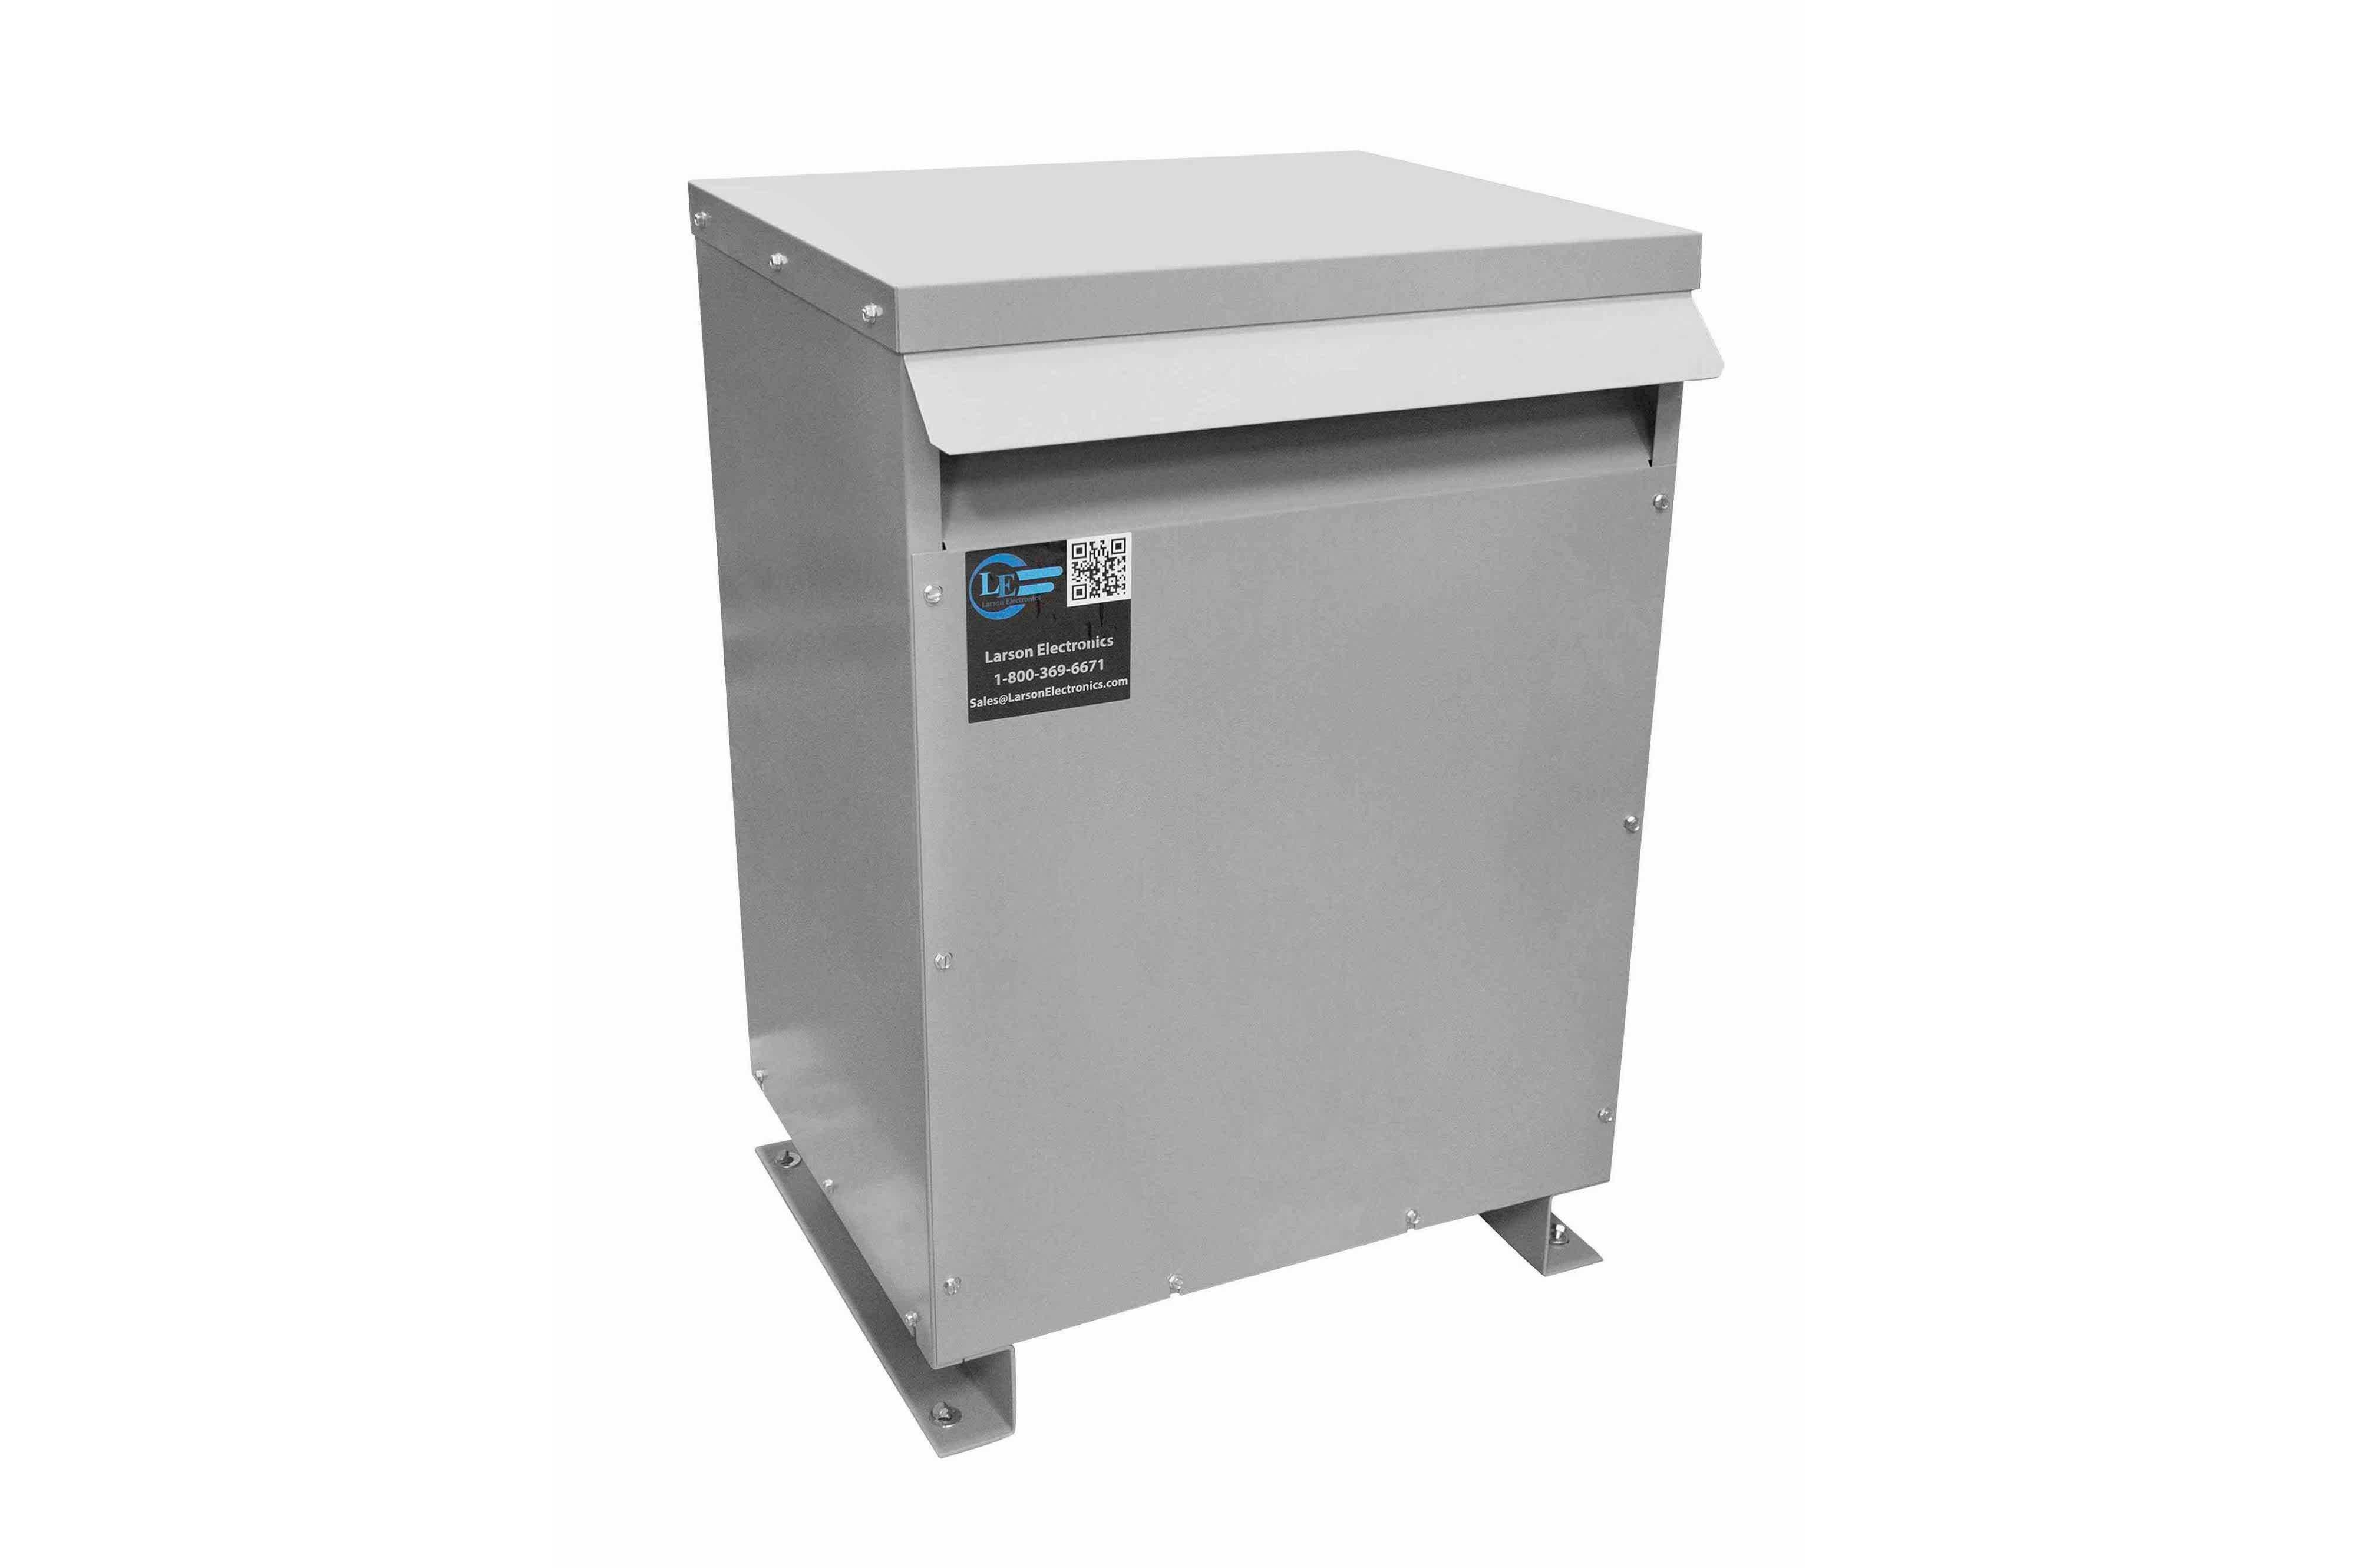 20 kVA 3PH Isolation Transformer, 480V Wye Primary, 400Y/231 Wye-N Secondary, N3R, Ventilated, 60 Hz